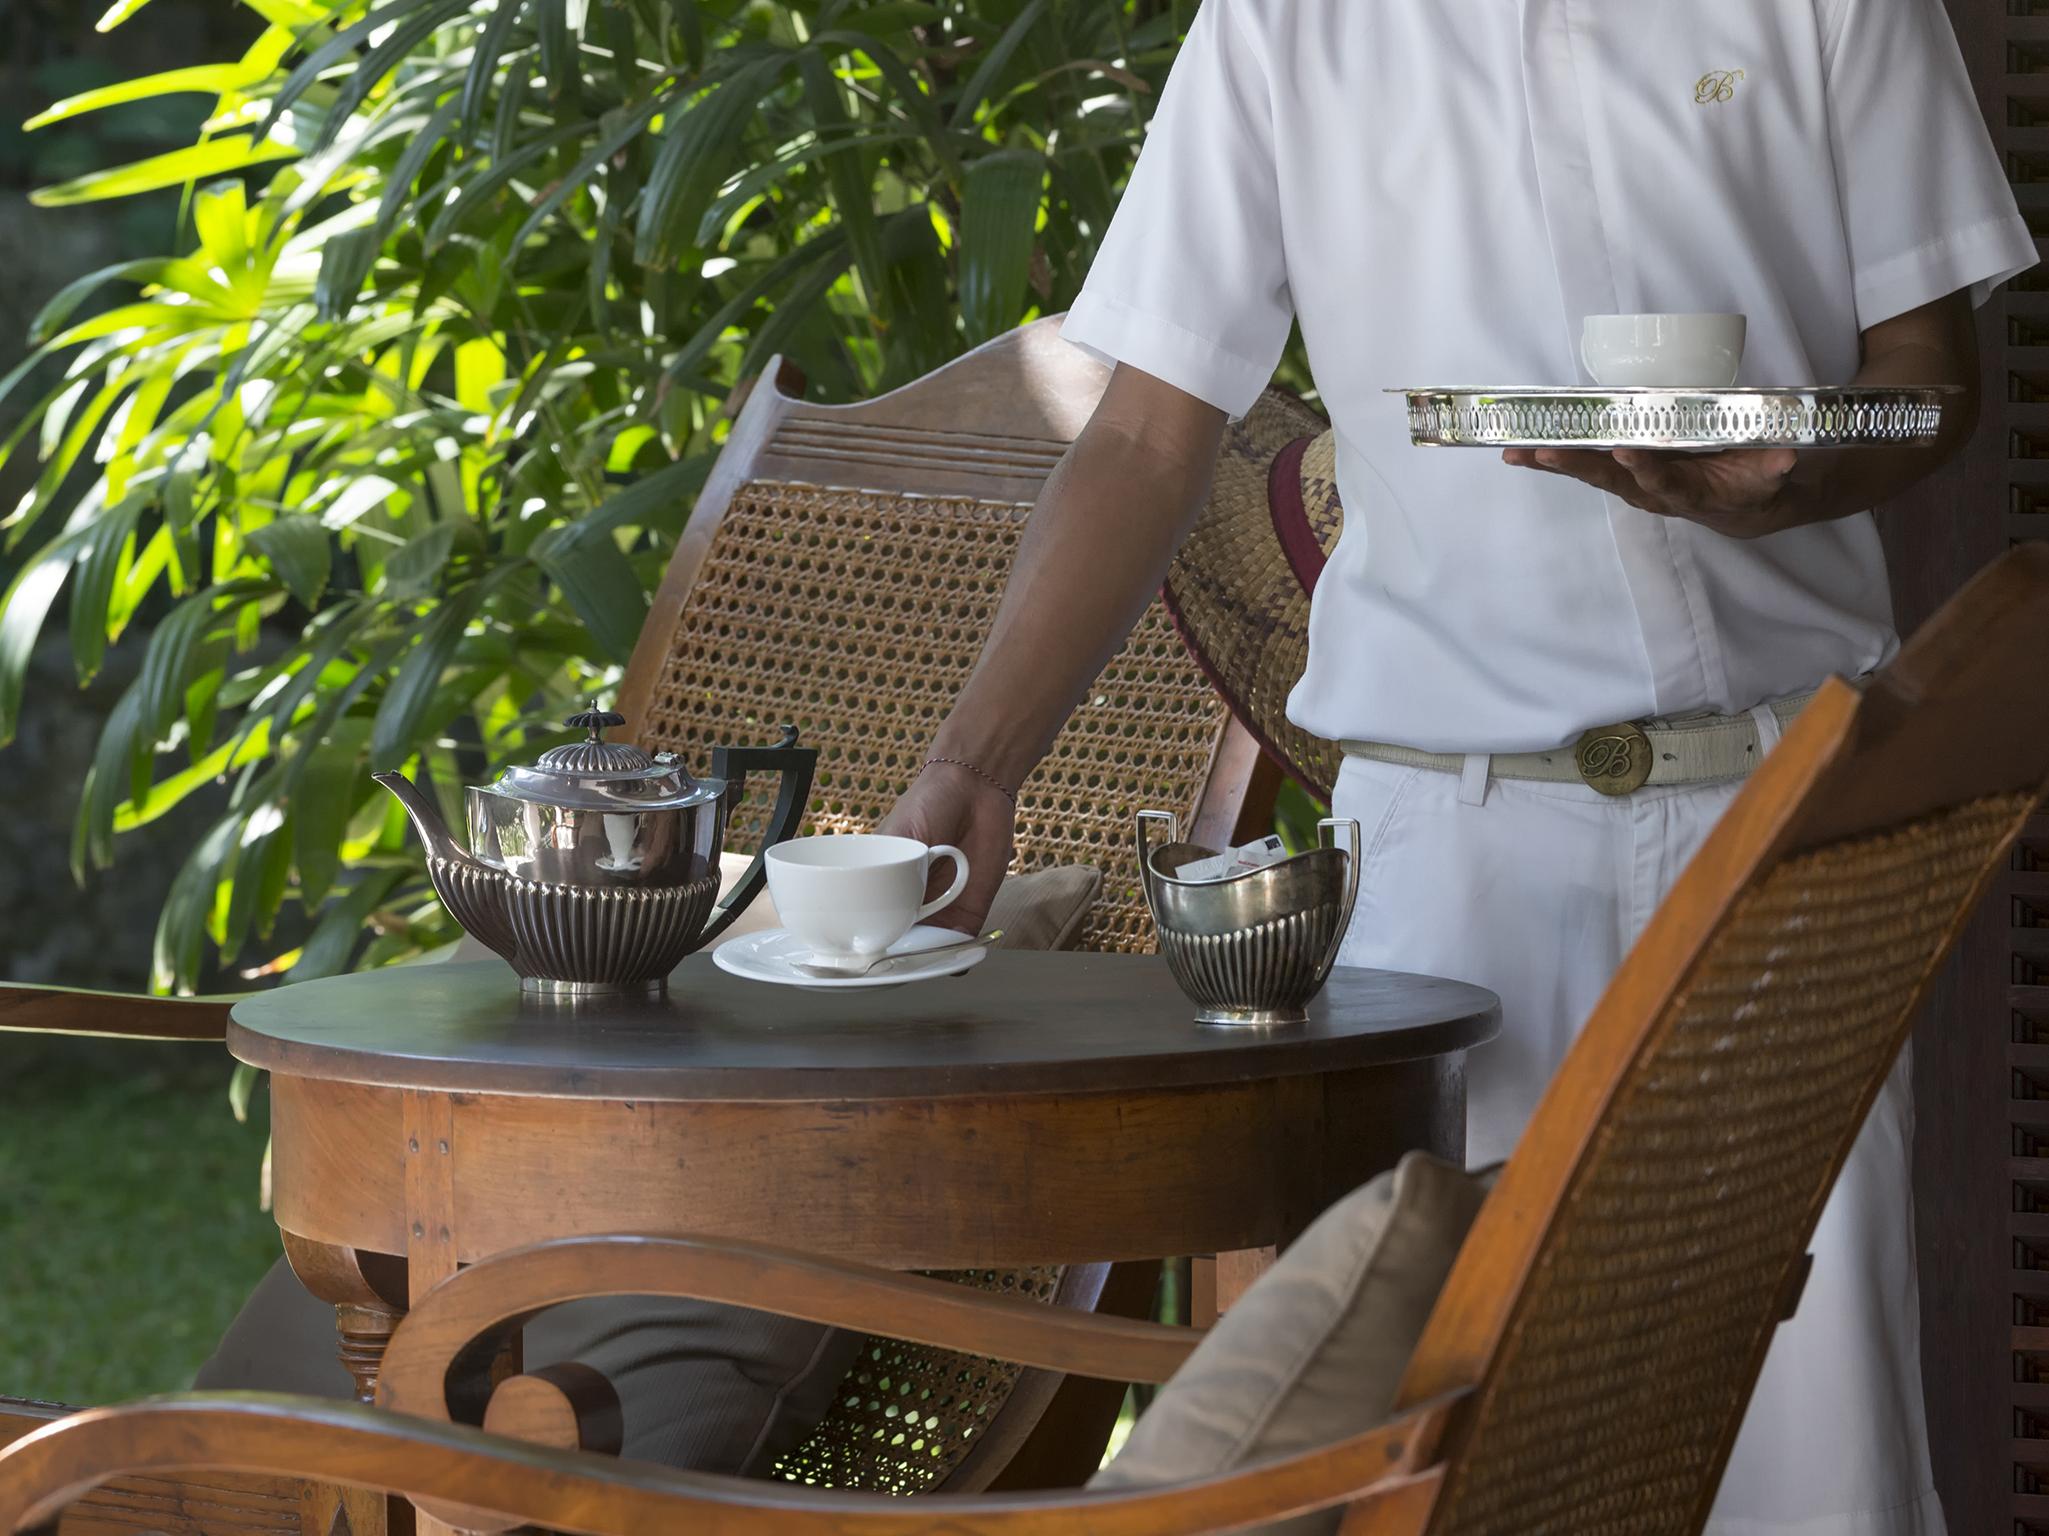 03-Villa Batavia - Tea service.jpg